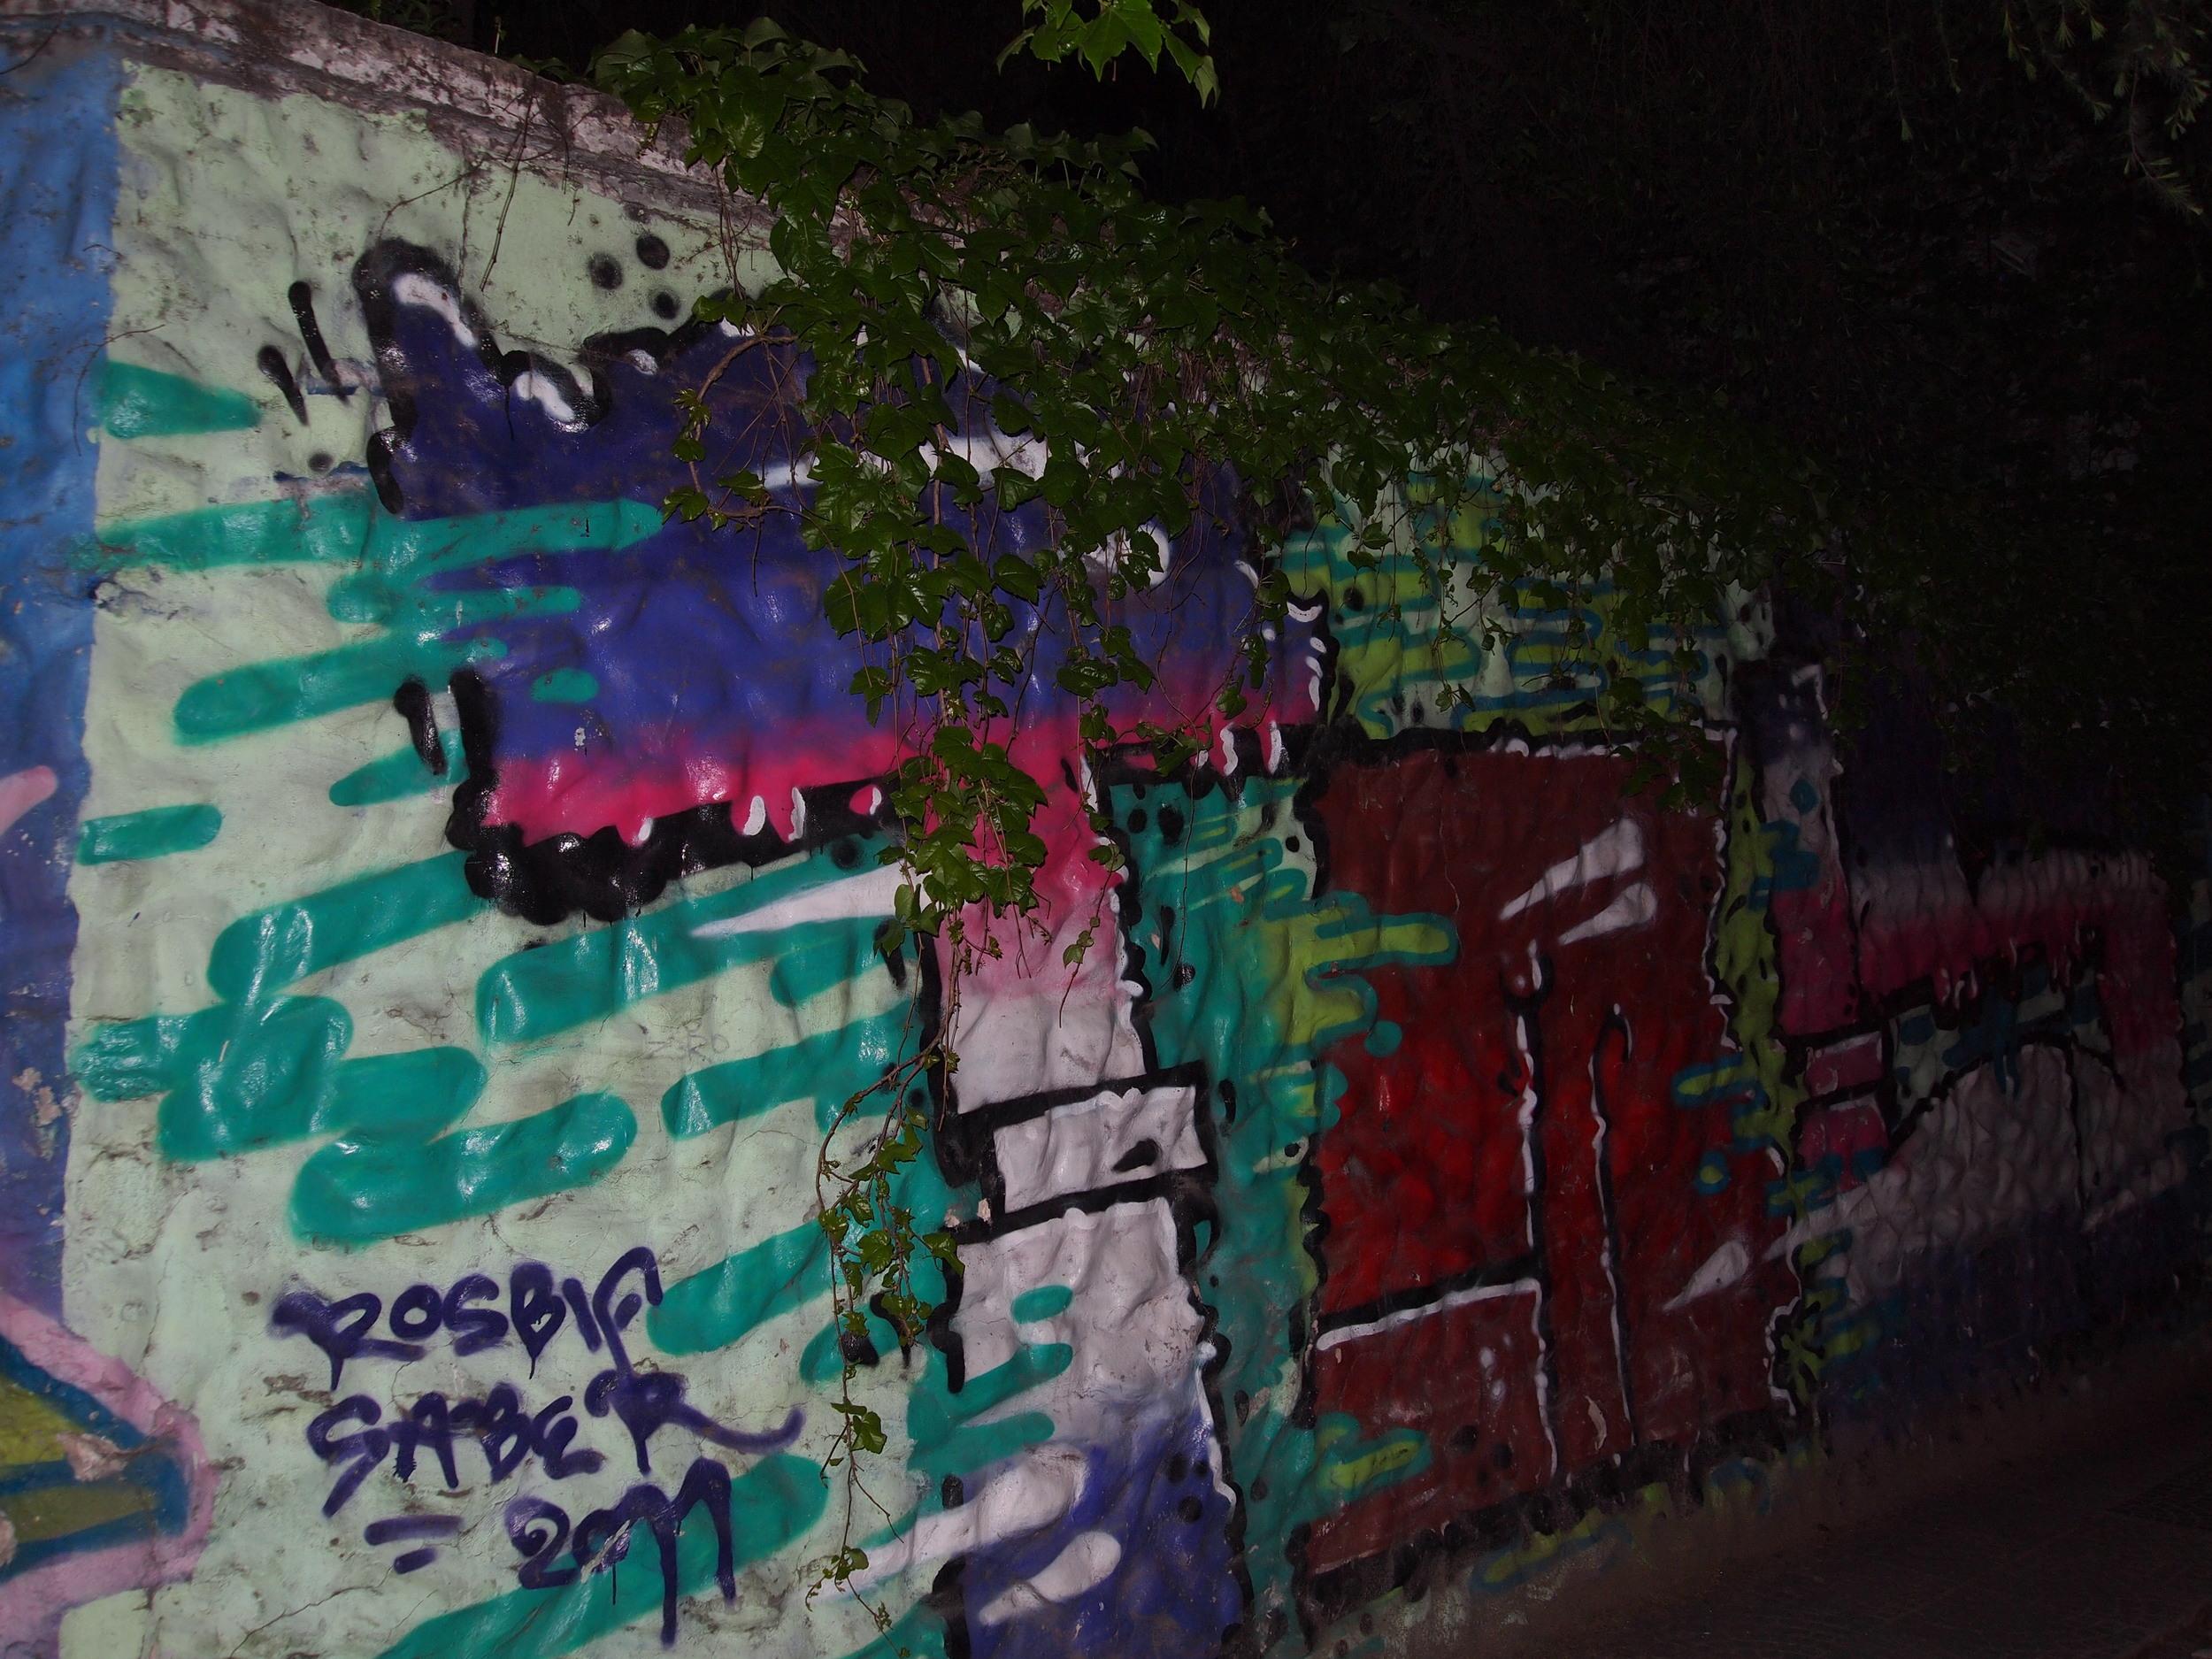 Palermo_Soho_Graffiti.JPG